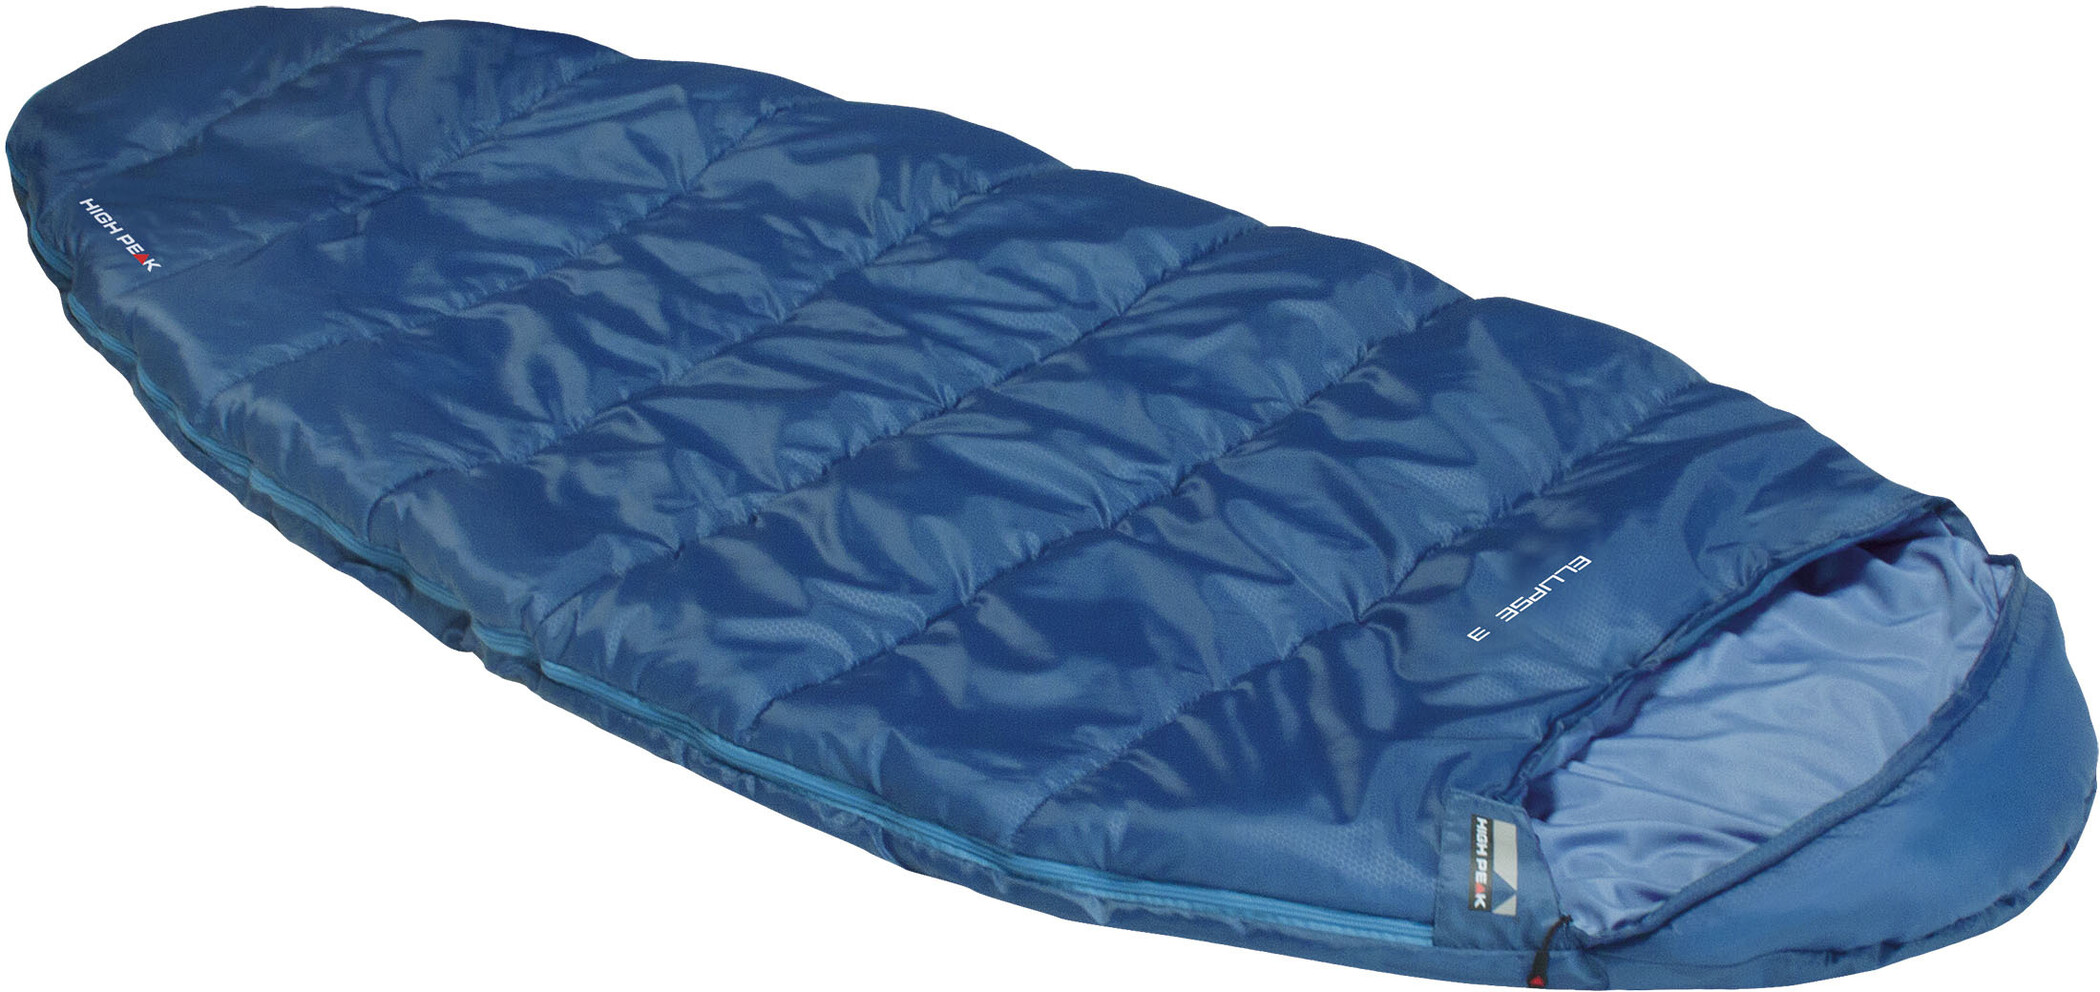 High Peak Ellipse 3 Sovepose, blue (2019)   Misc. Transportation and Storage